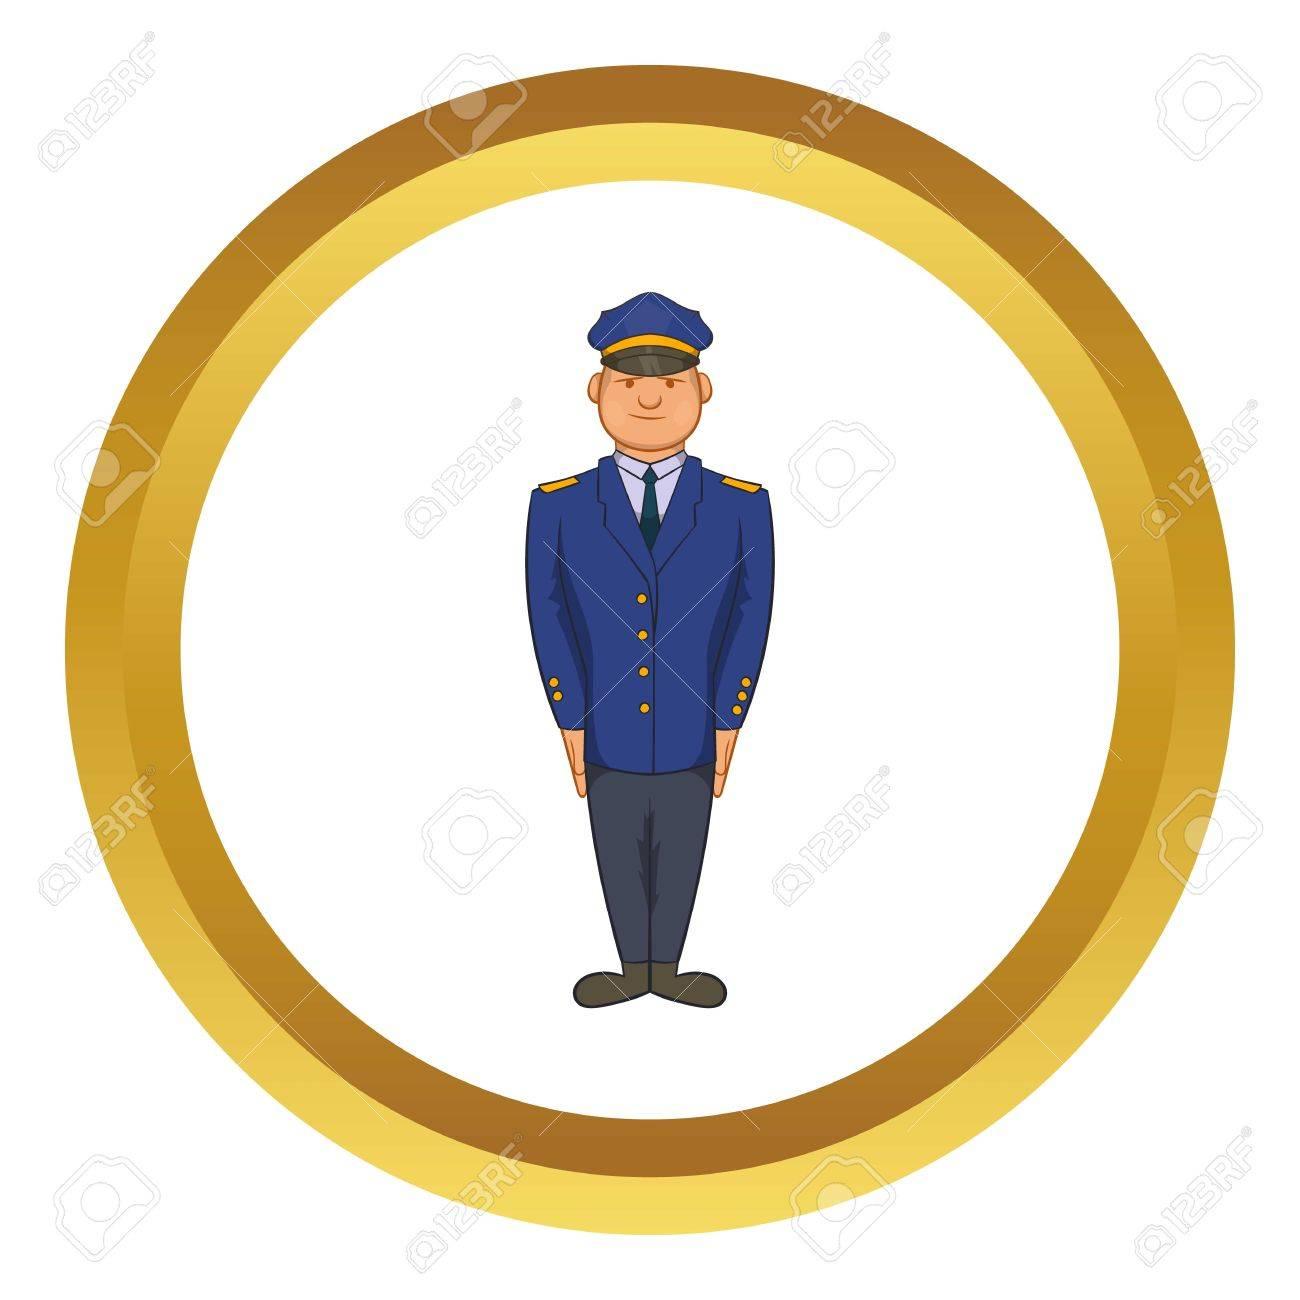 policemen vector icon in golden circle cartoon style isolated